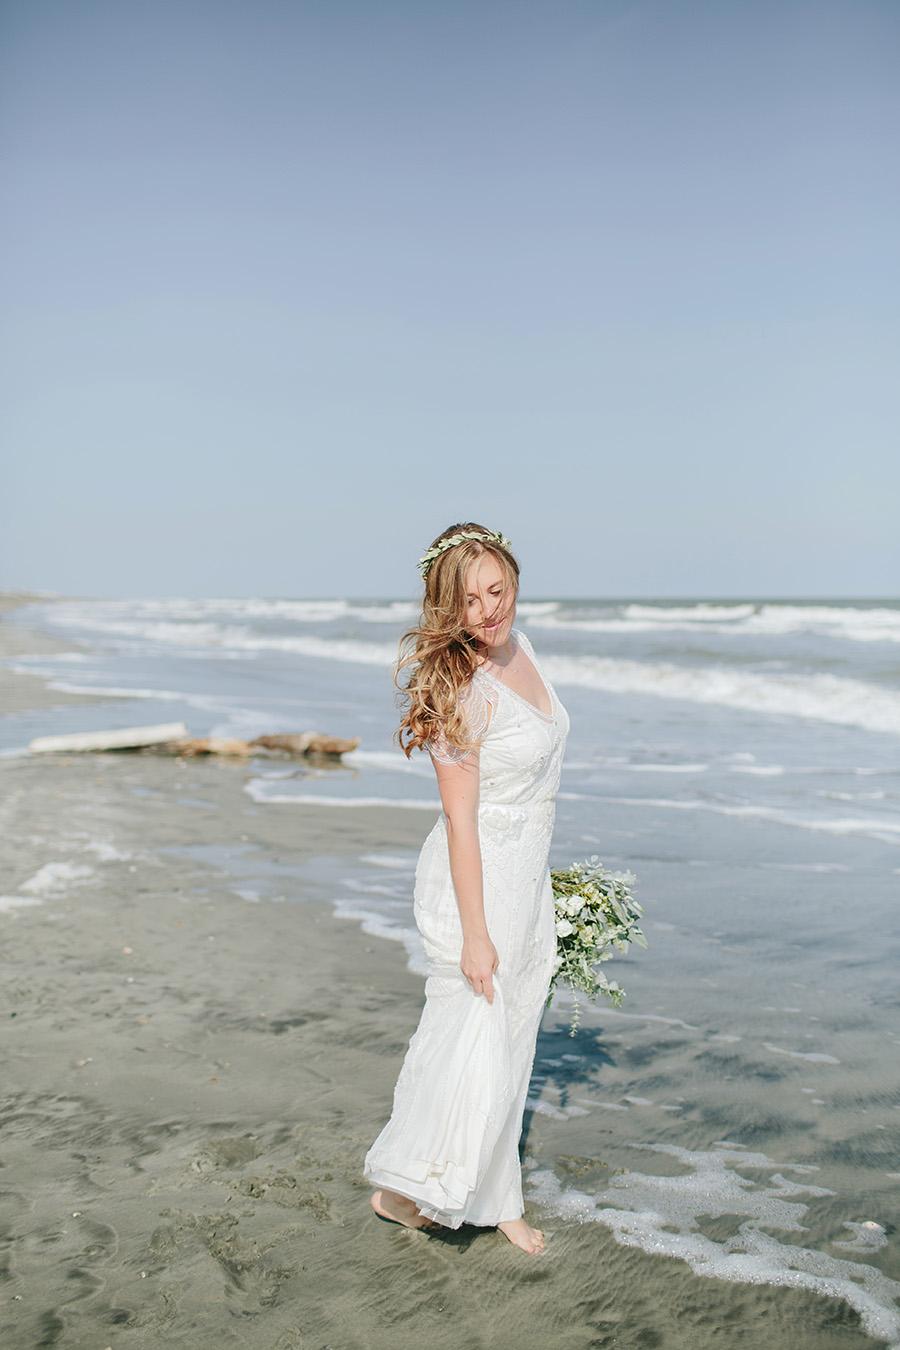 DavisWedding - Alicia White Photography-545.jpg